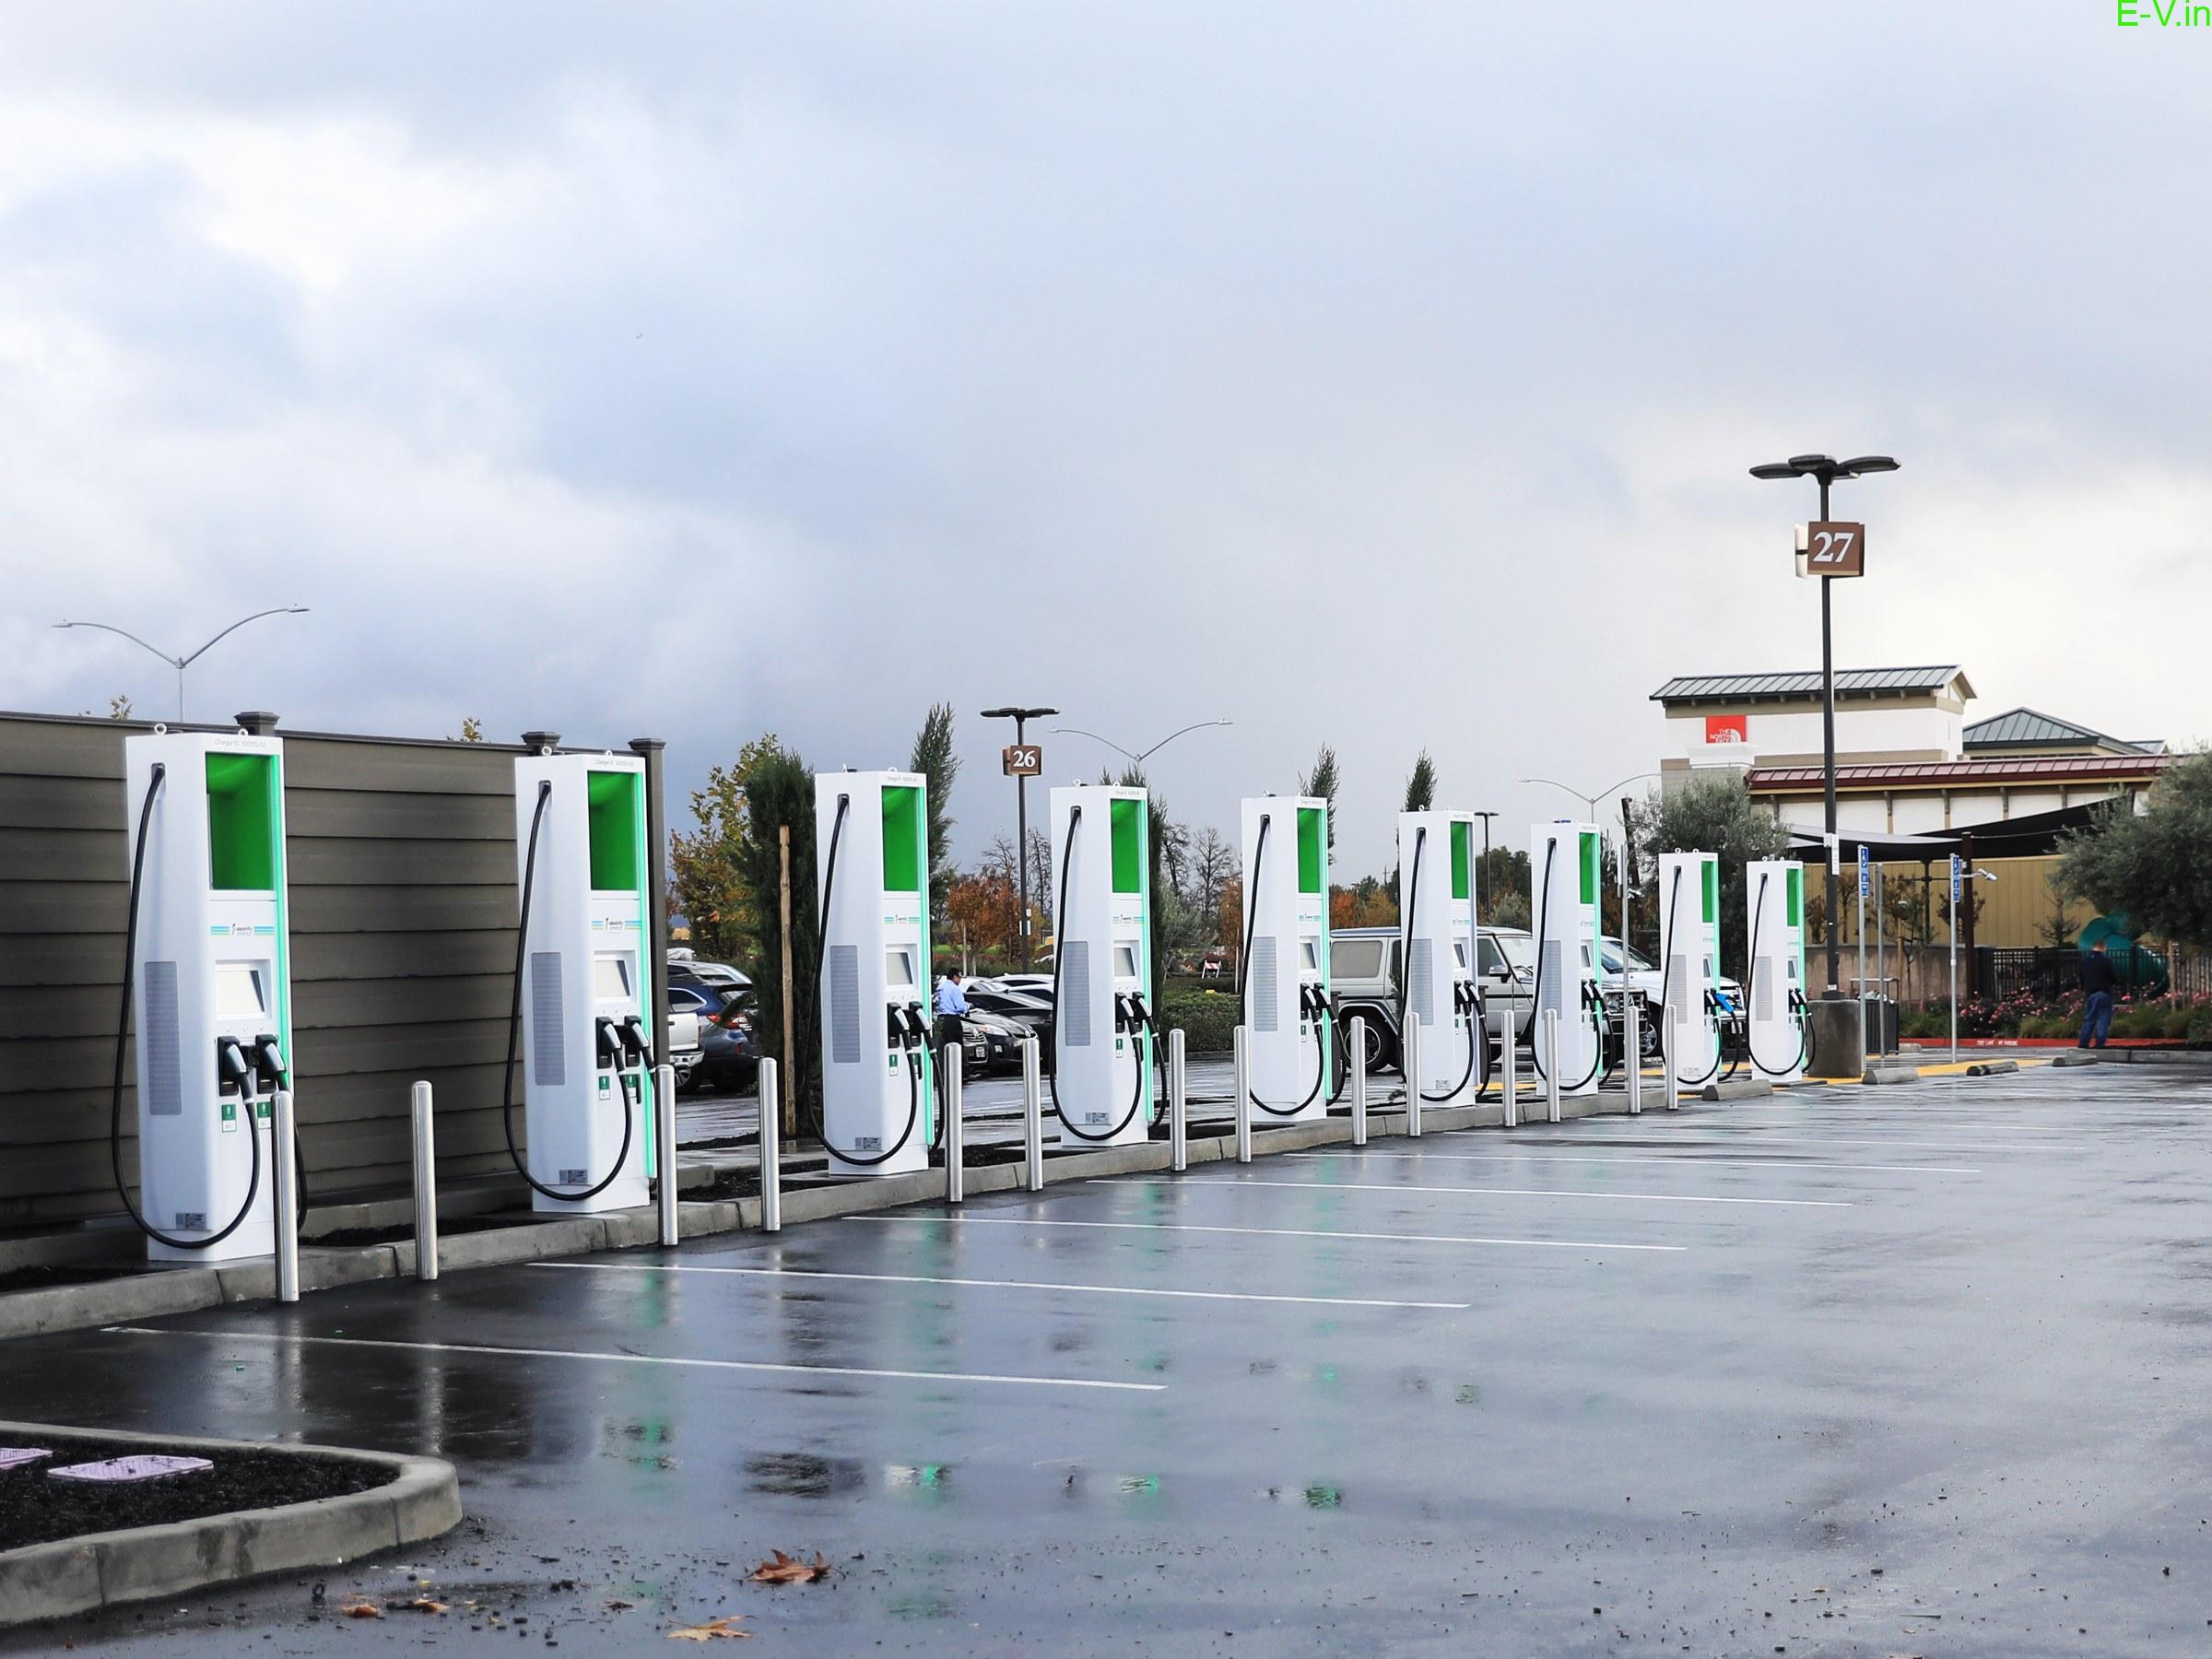 100 EV charging stations